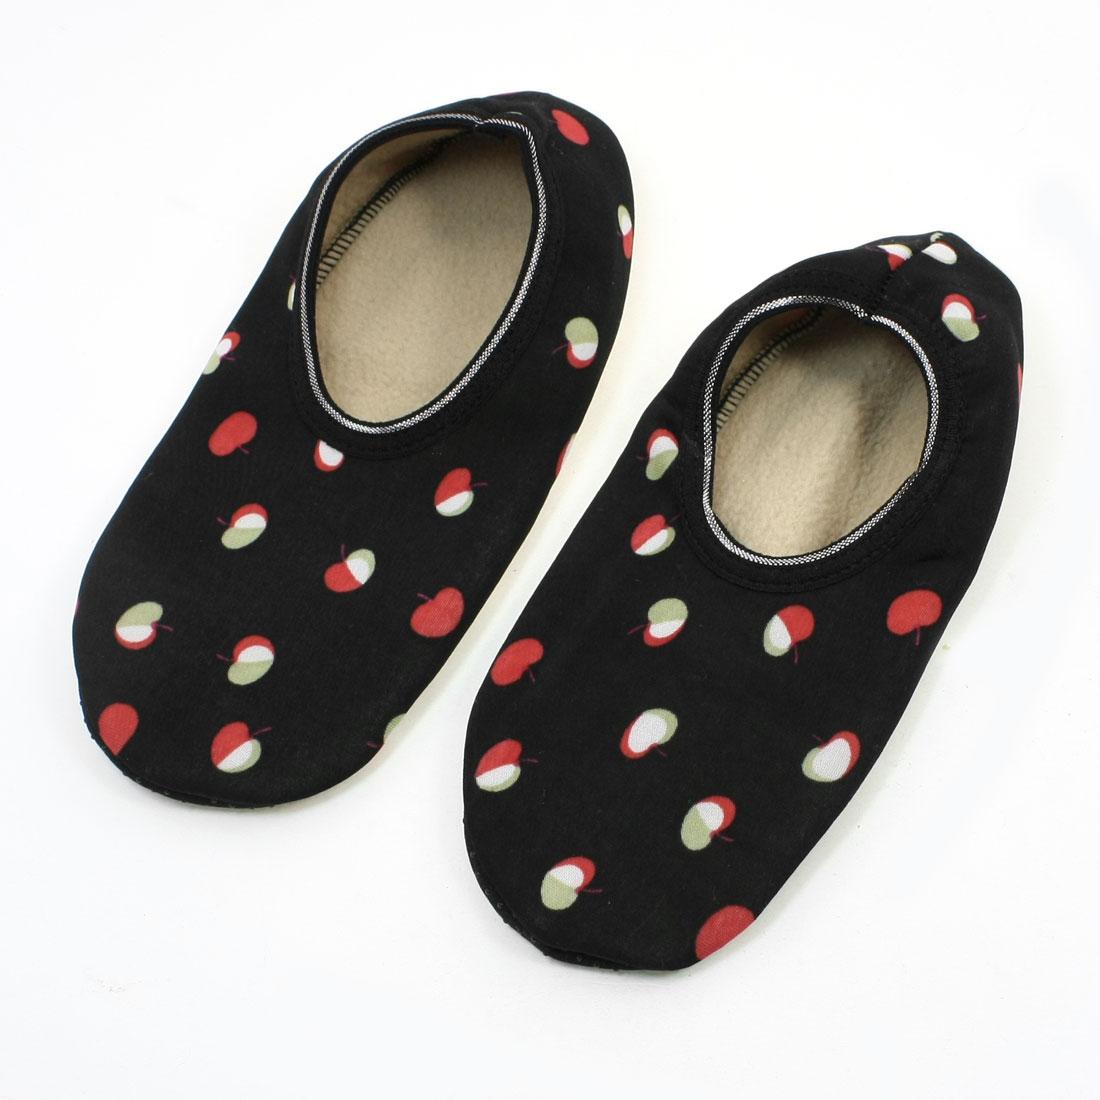 Women Red Apple Print Warm Anti-skidding Floor Boat Socks Pair Size M